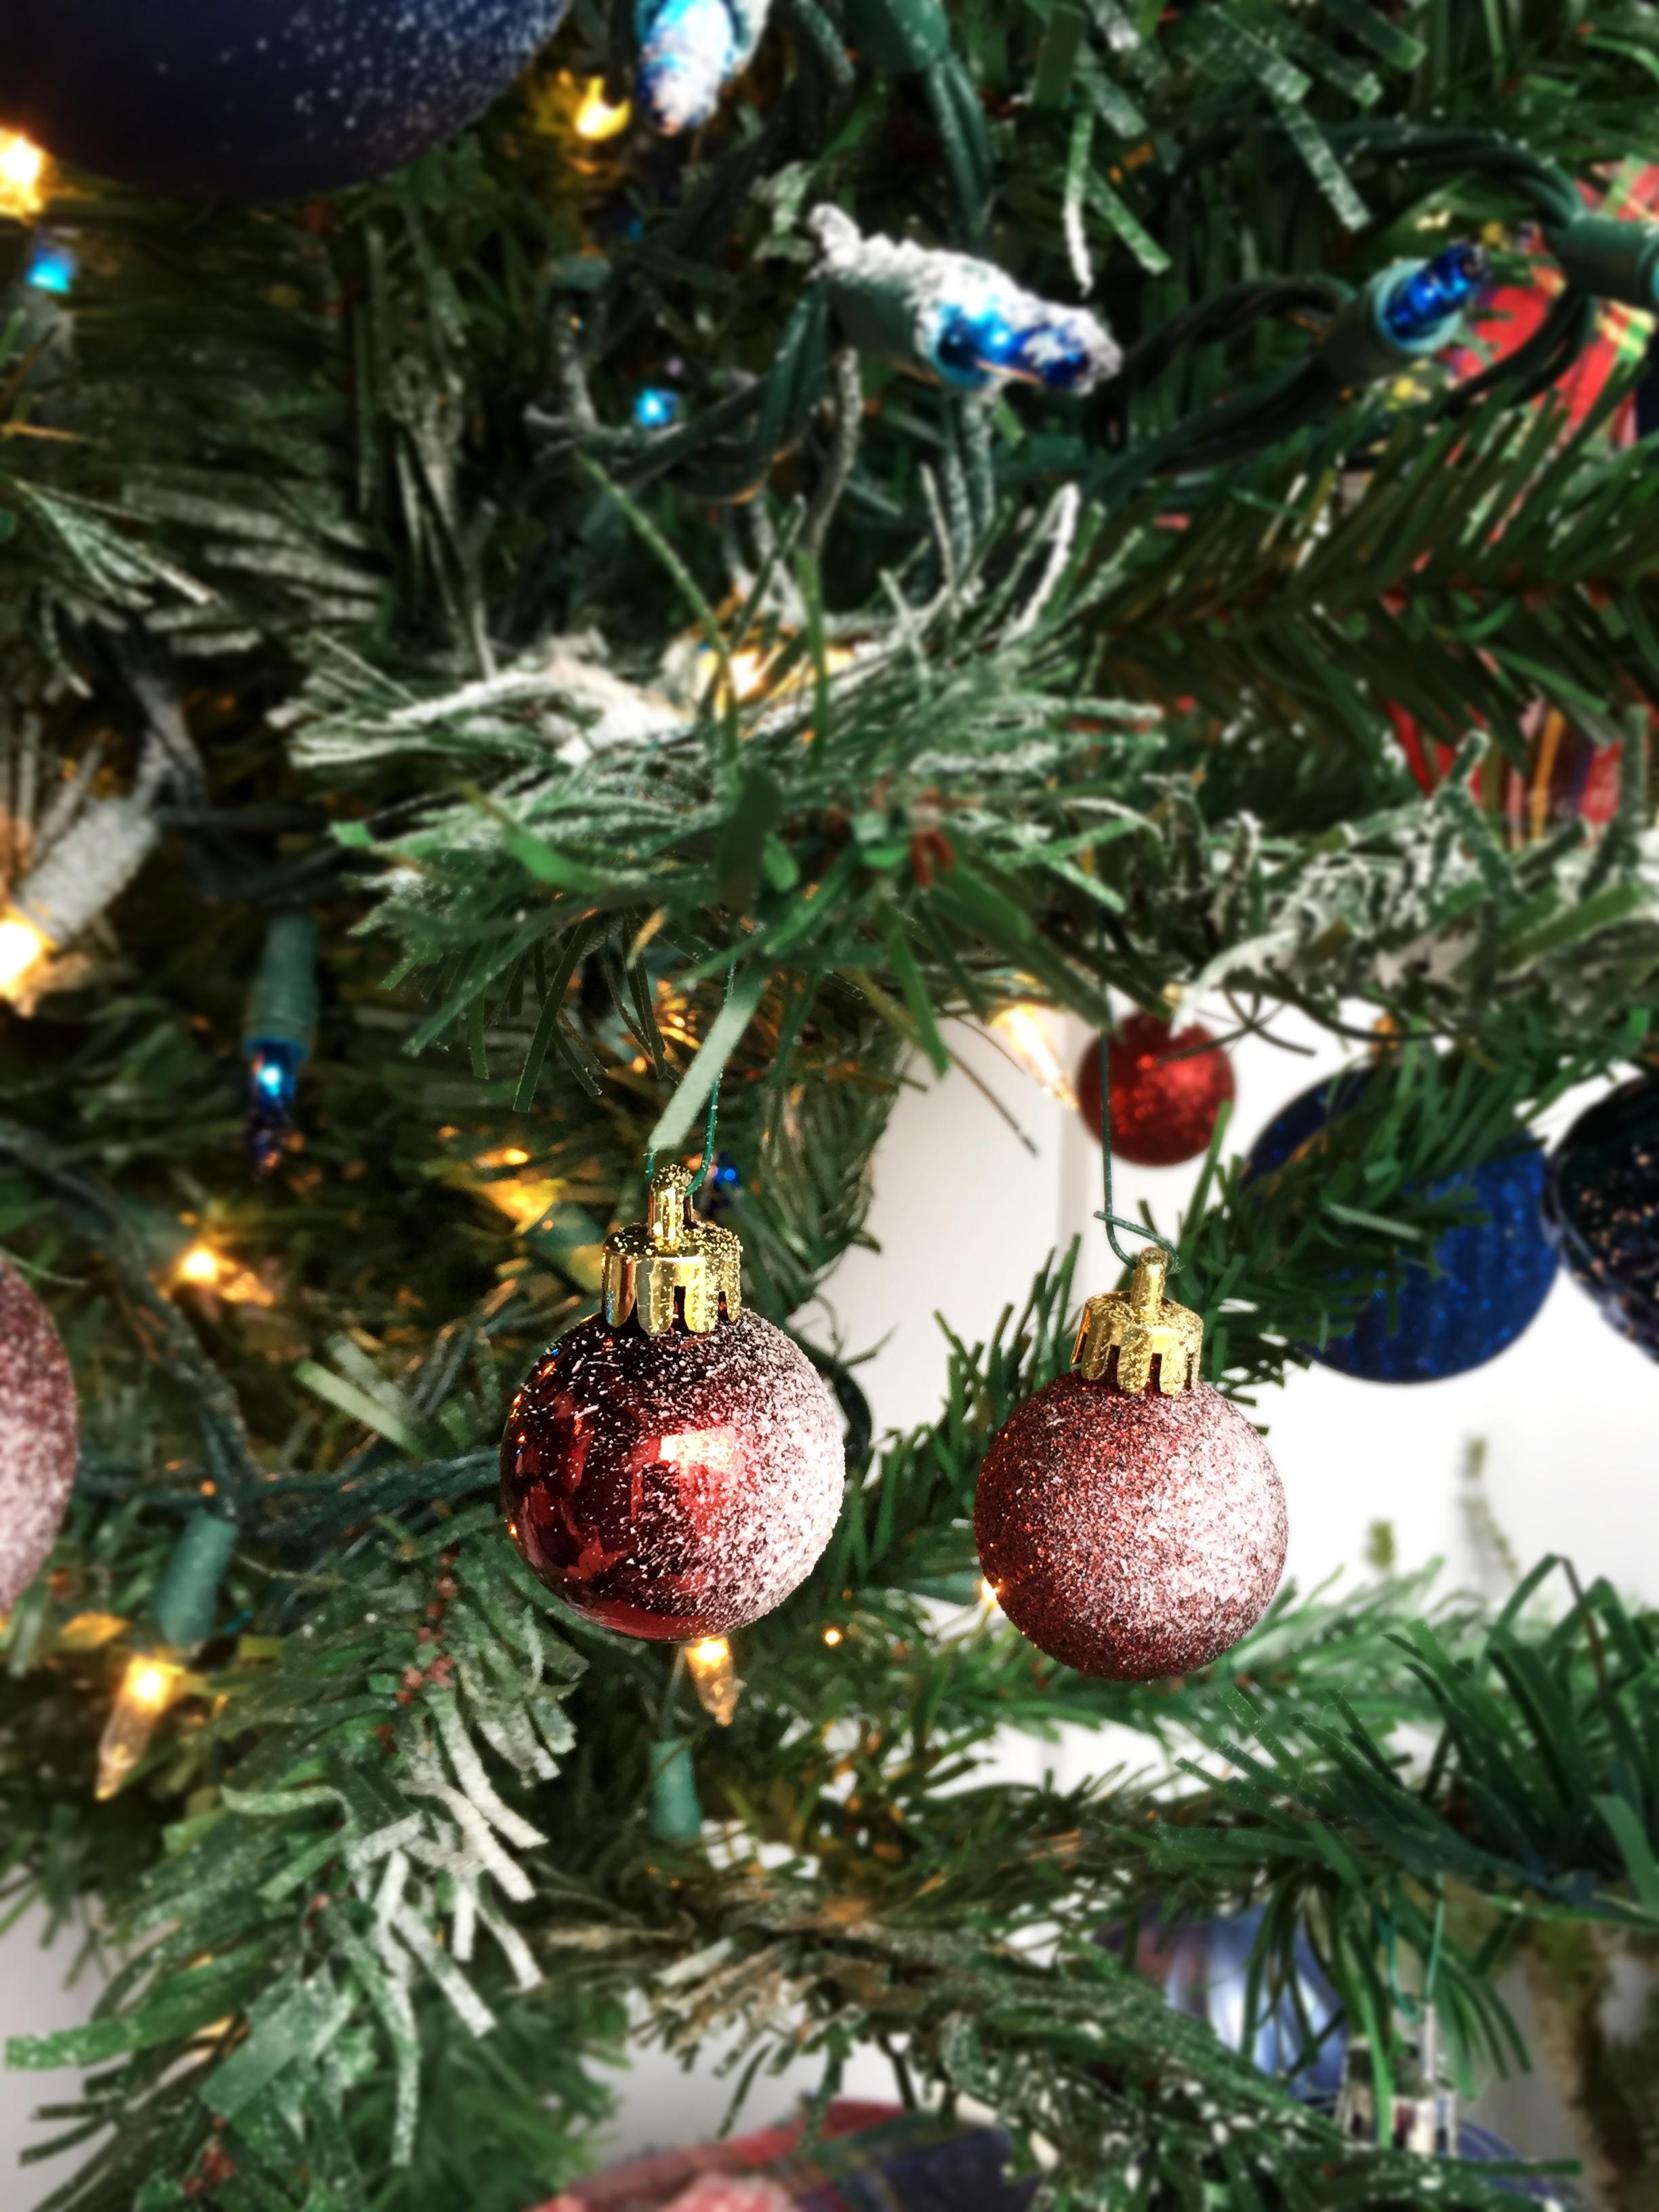 Plaid Christmas Tree Rustic And Plaid Christmas Front Porch Decor Inspiration